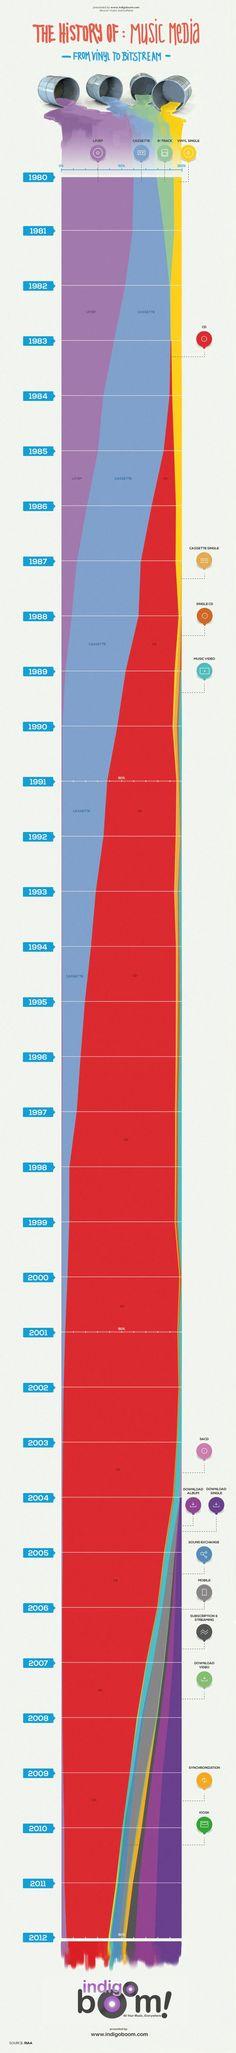 The history of Music Media #infografia #infographic